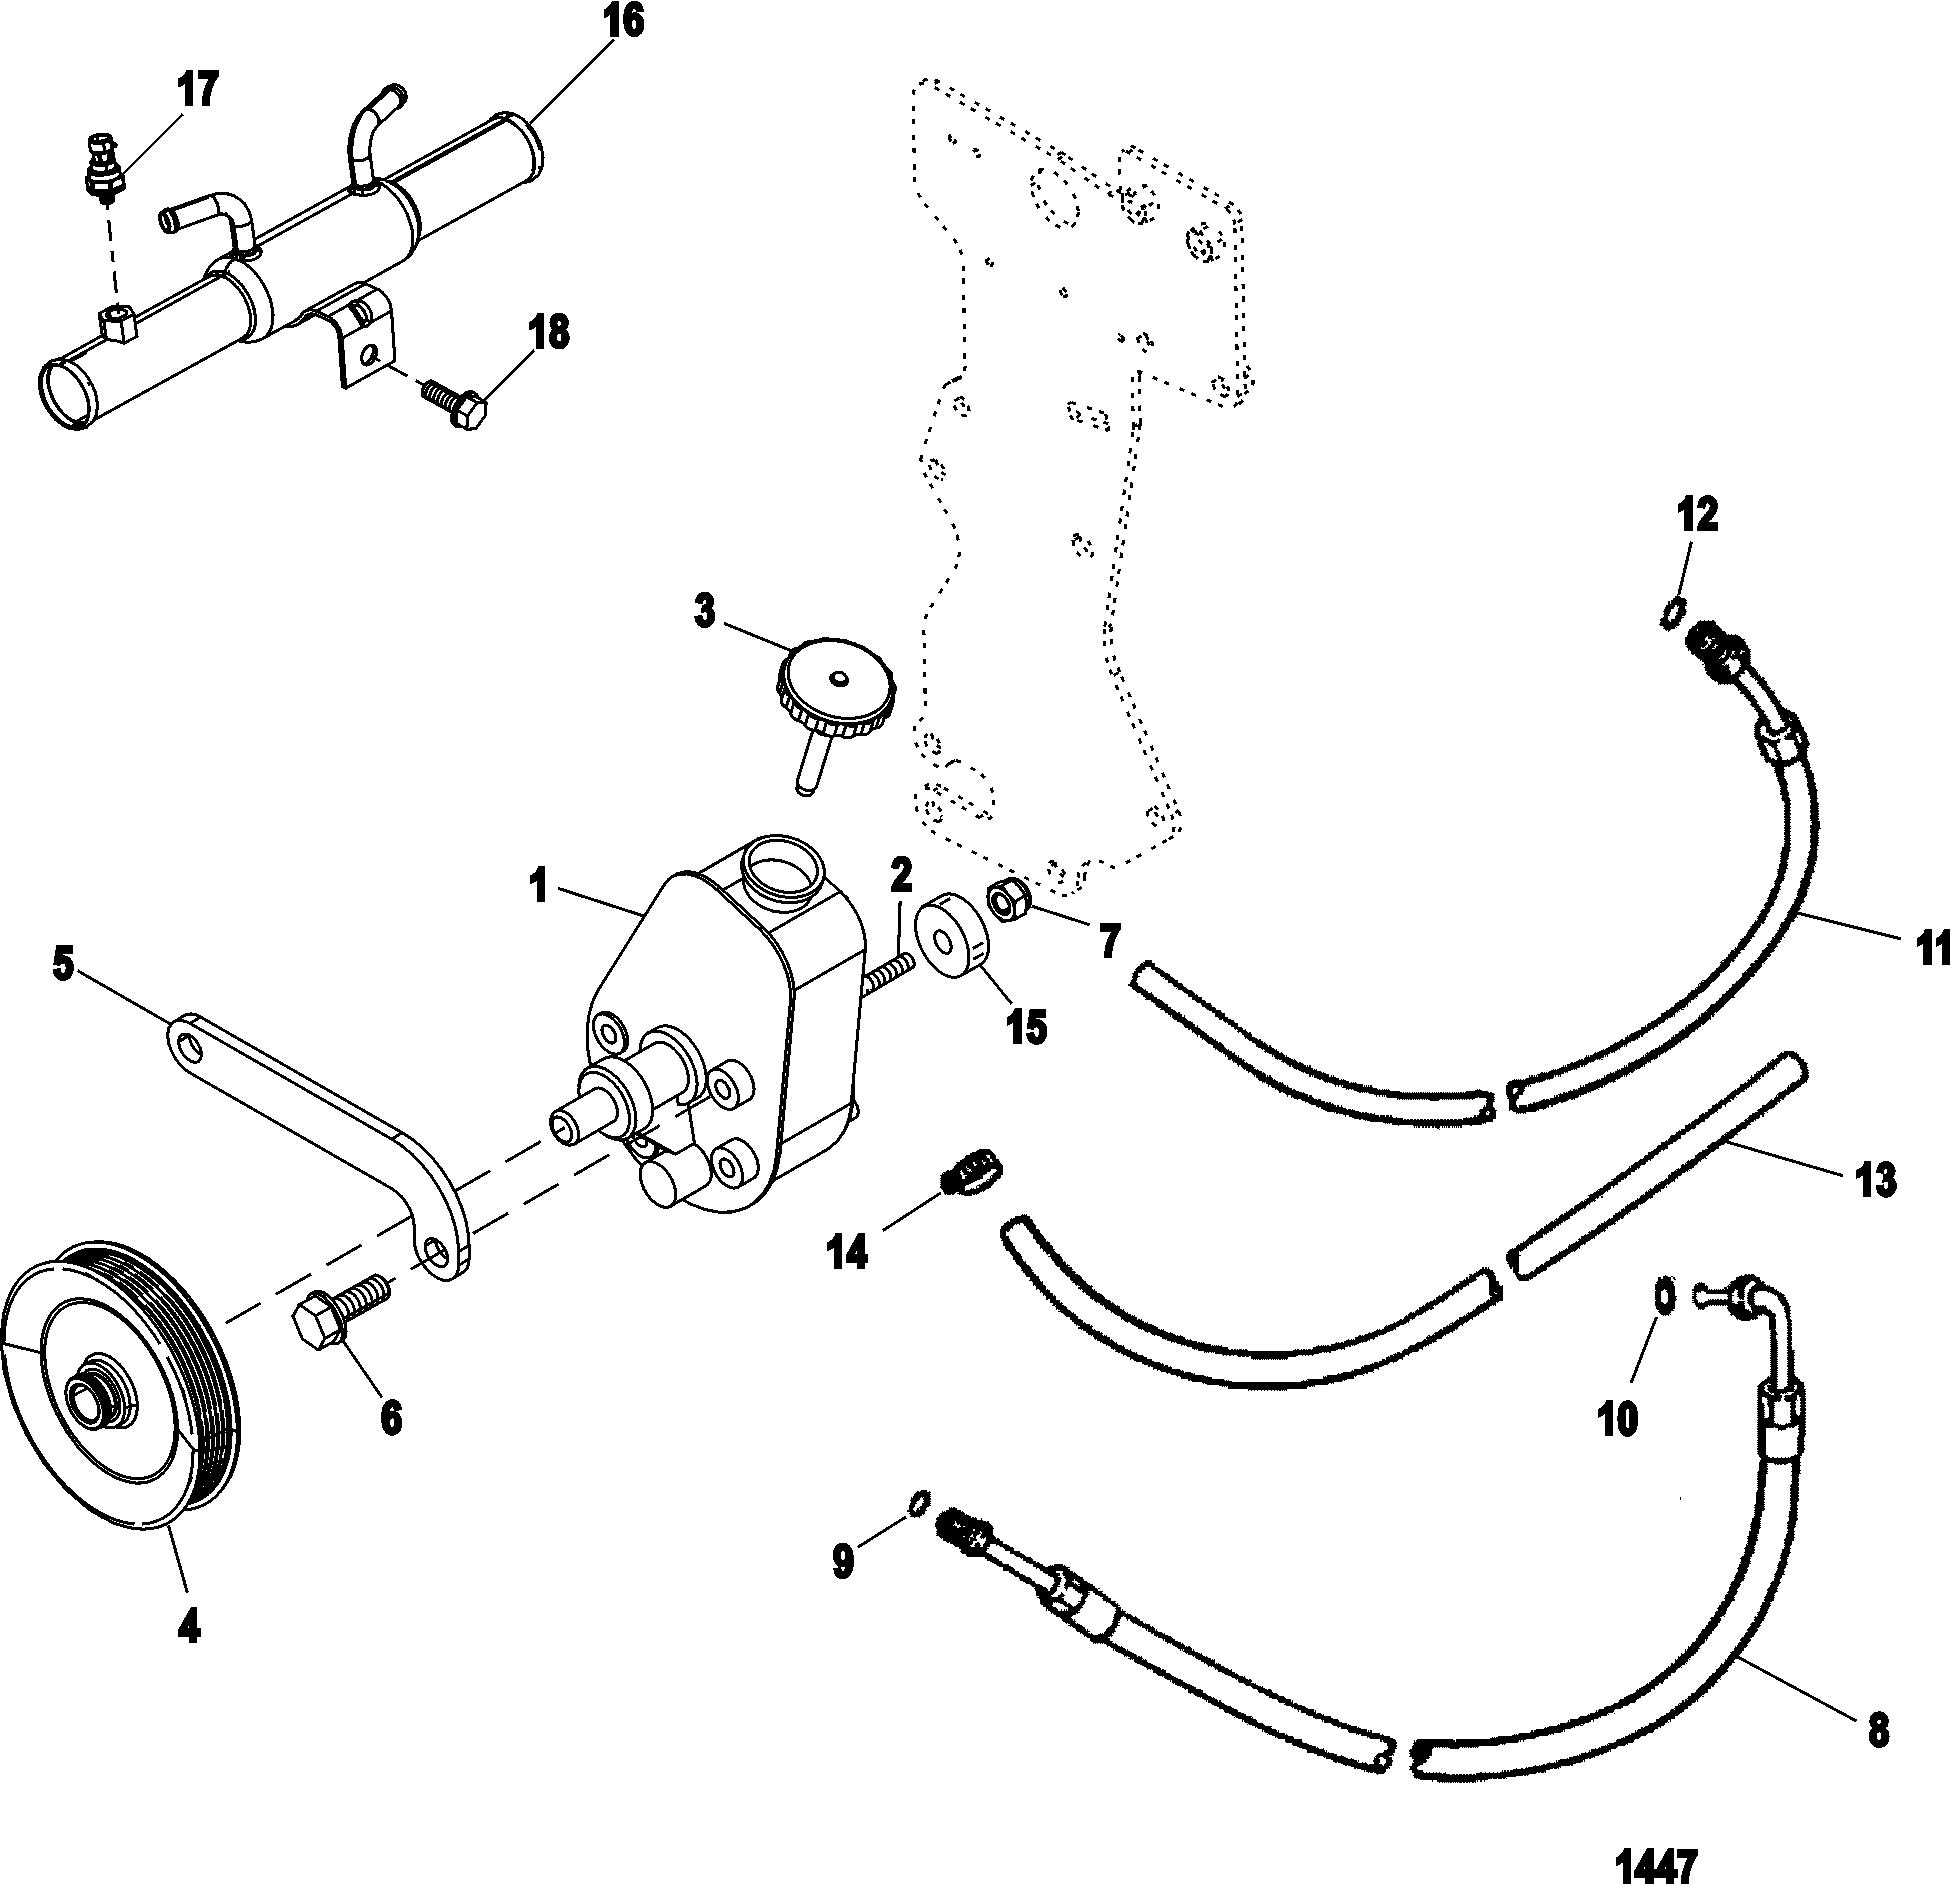 Mercruiser 350 Mag Mpi Alpha Bravo Chrysler Marine Cooling Diagram Power Steering Components